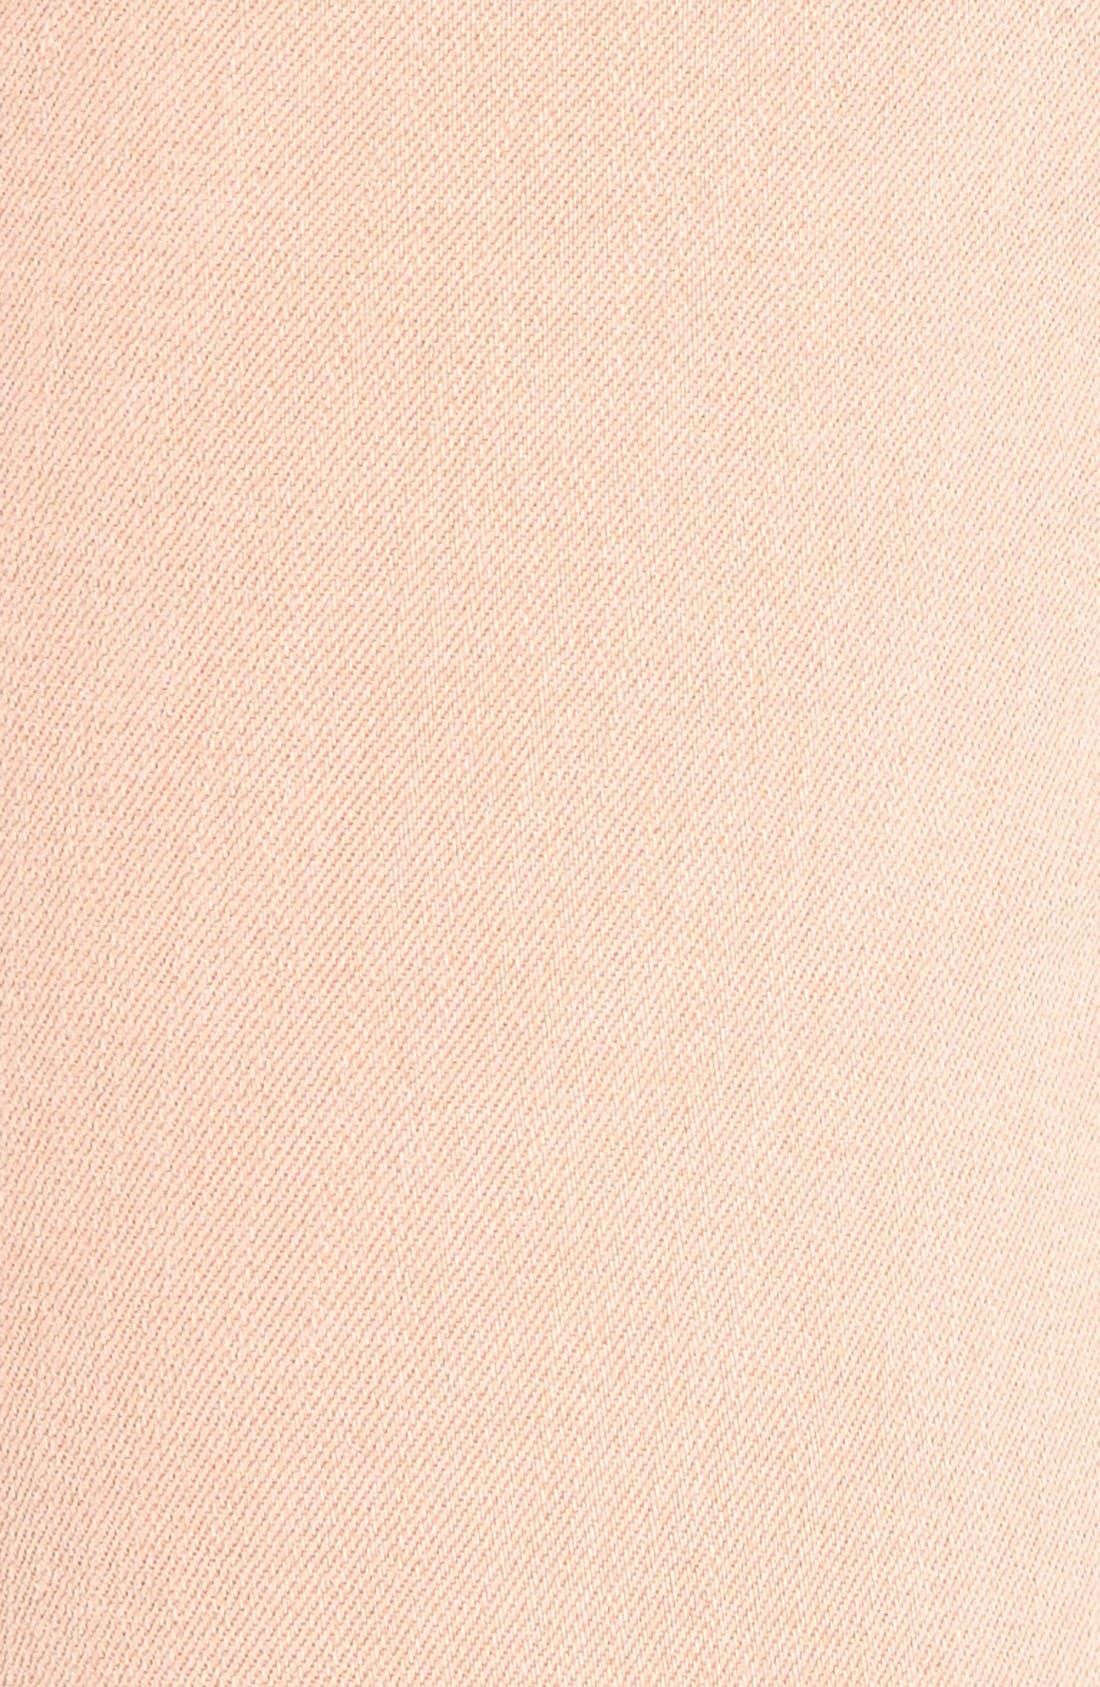 Alternate Image 5  - NYDJ Ami Release Hem Stretch Skinny Jeans (Regular & Petite)